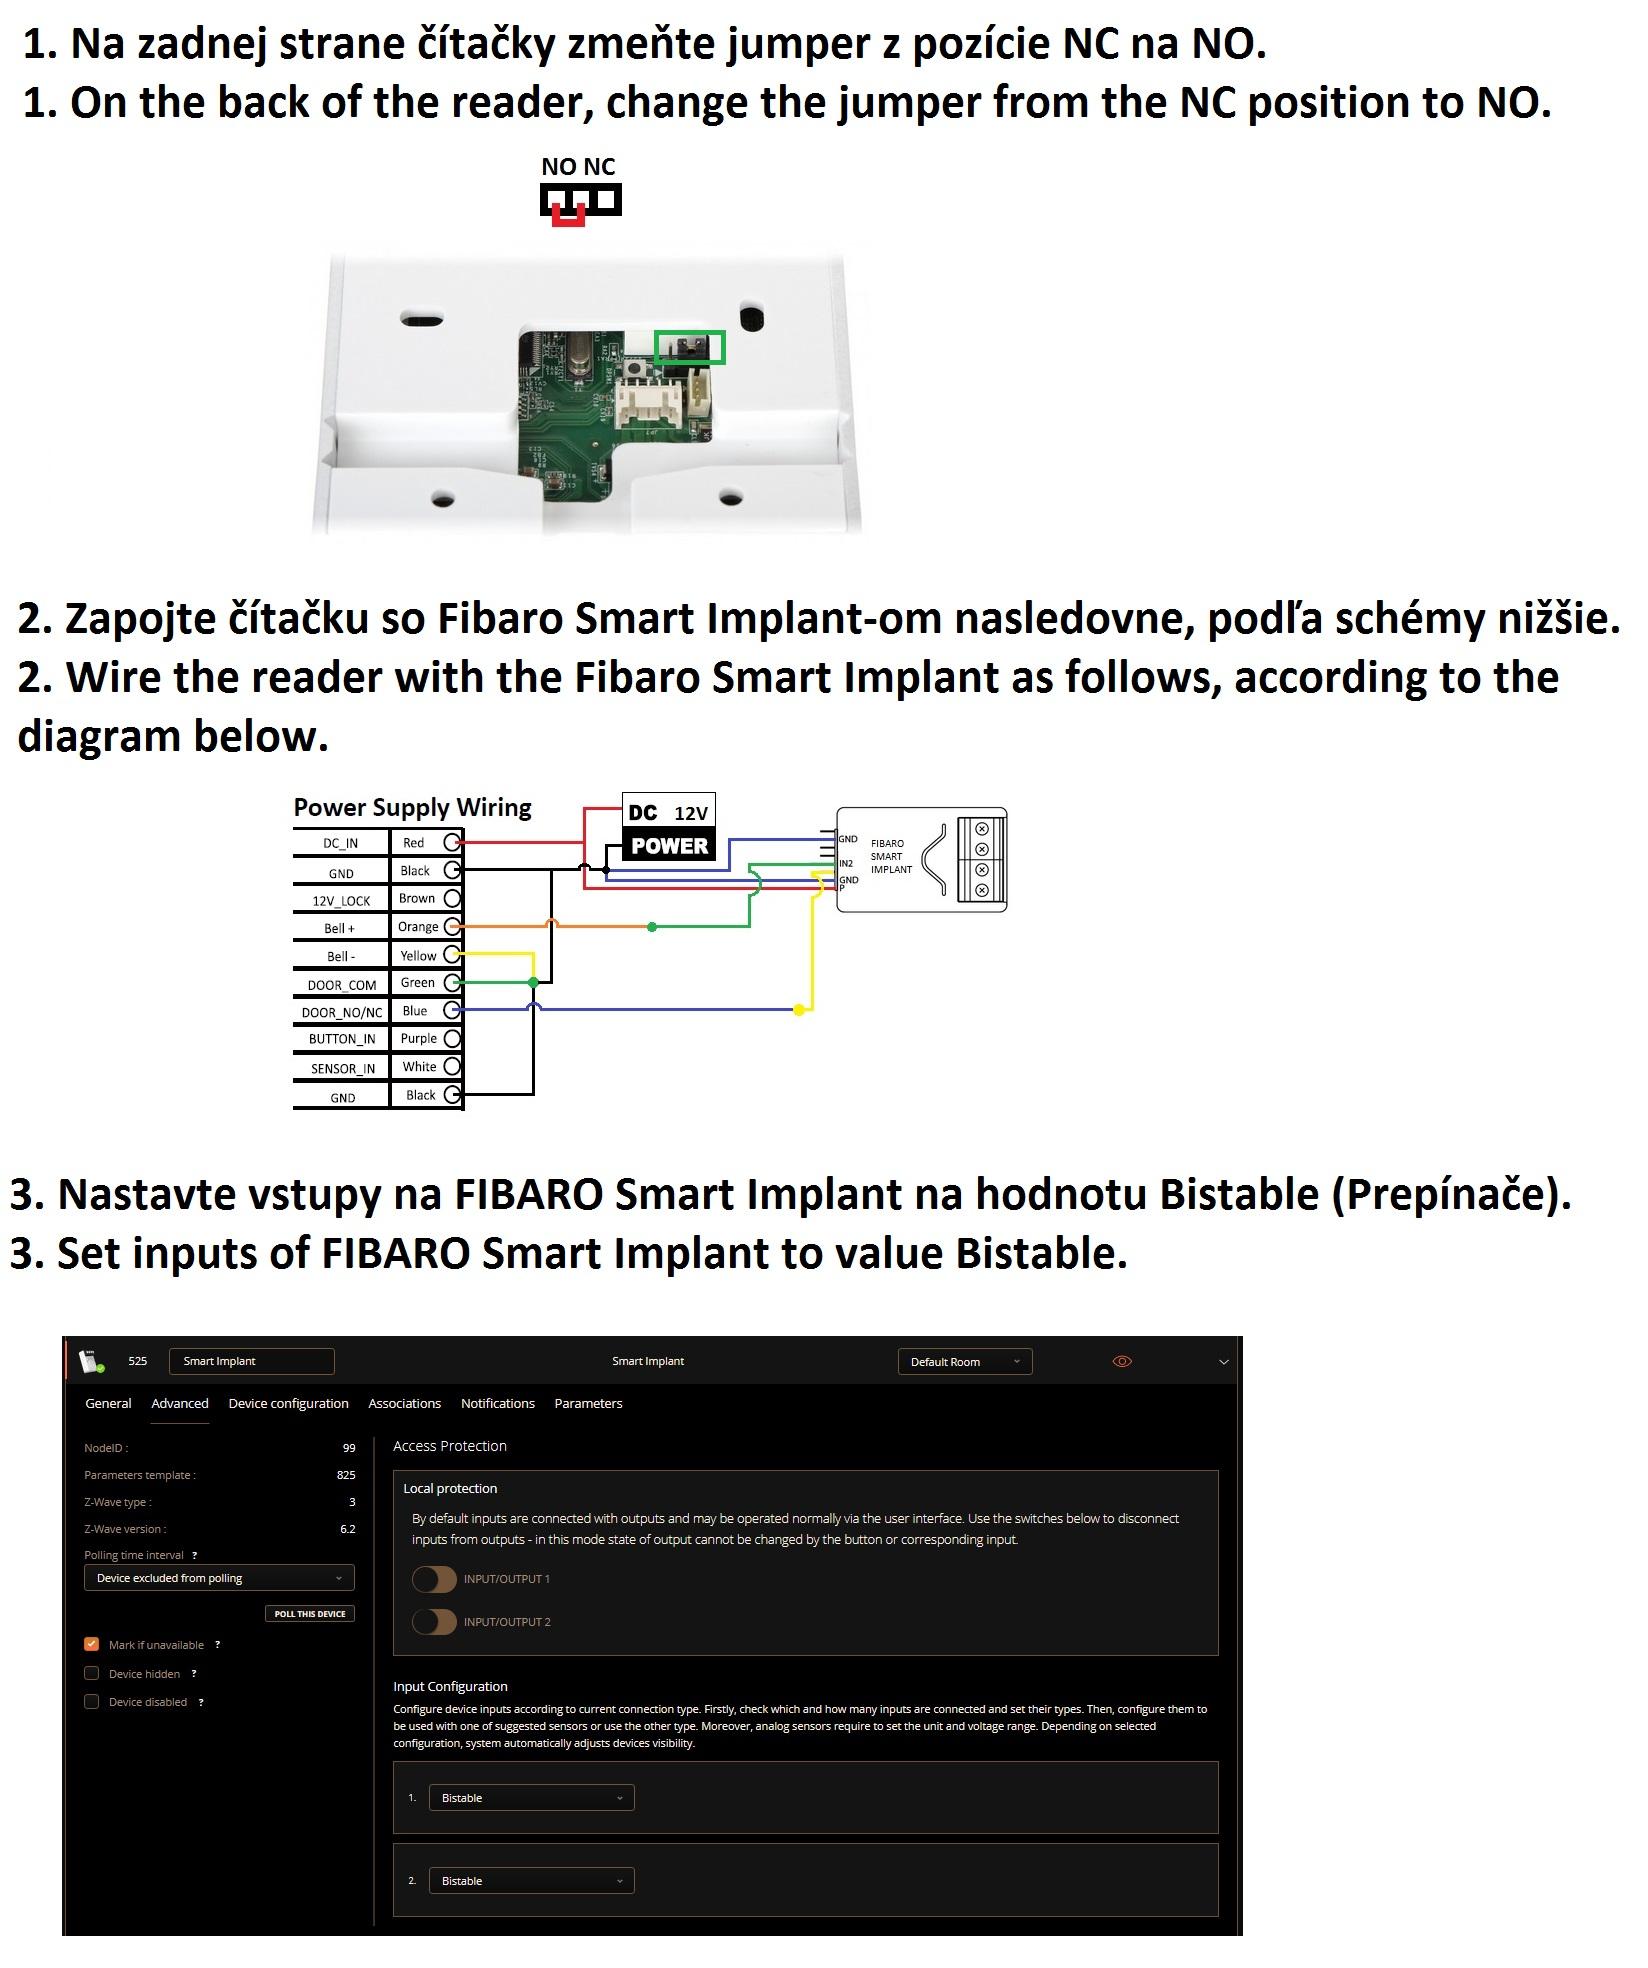 RFID reader and PIN code keypad with FIBARO Smart Implant